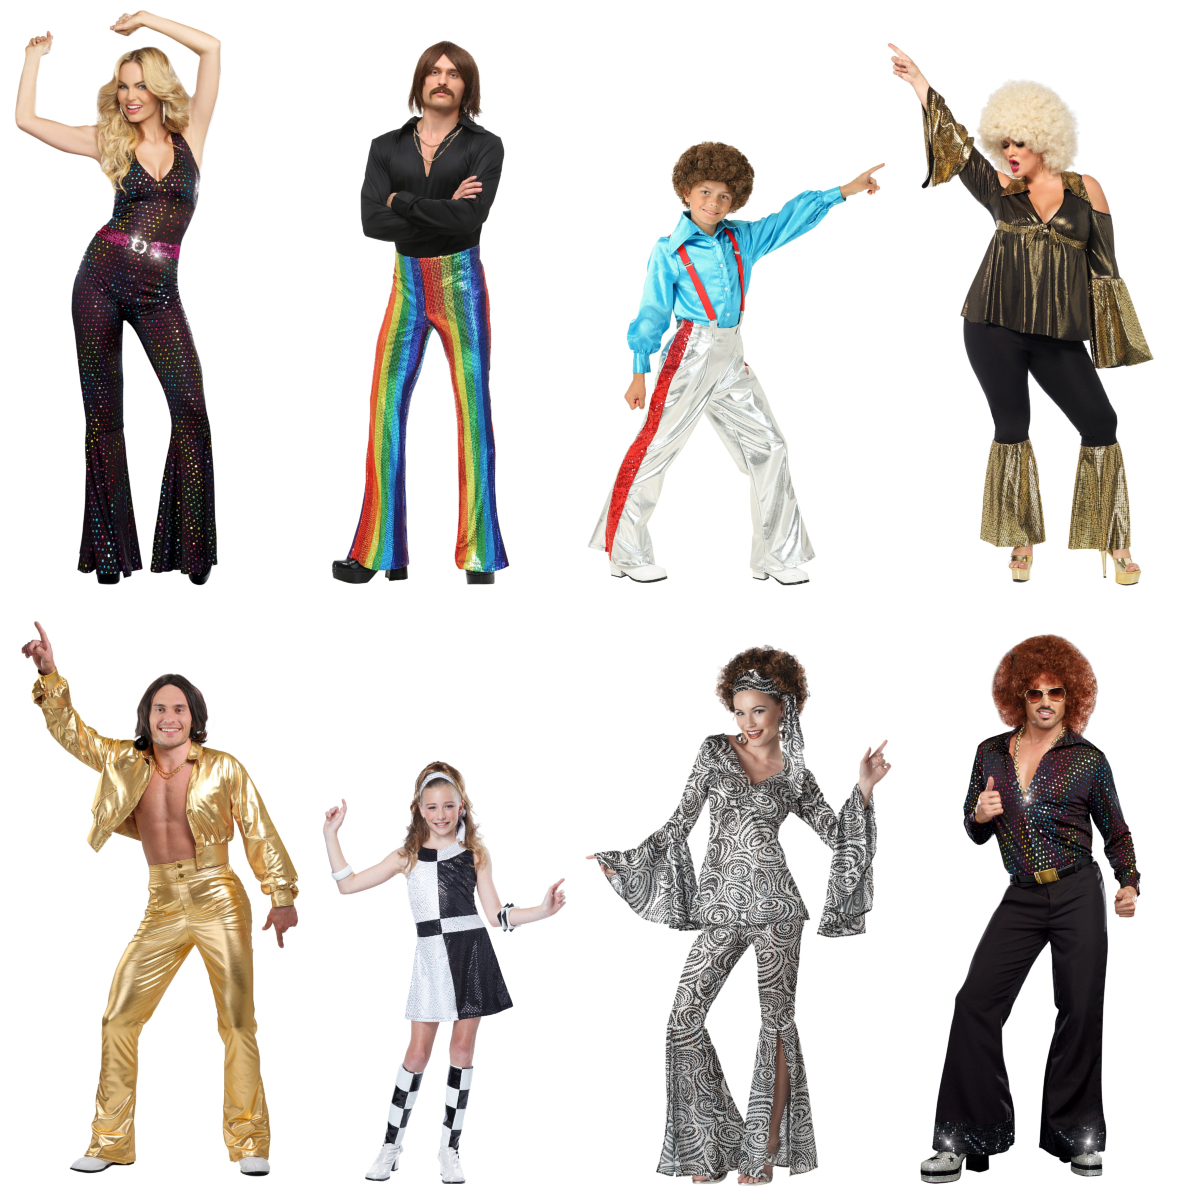 Disco Costumes to Take You to Funkytown